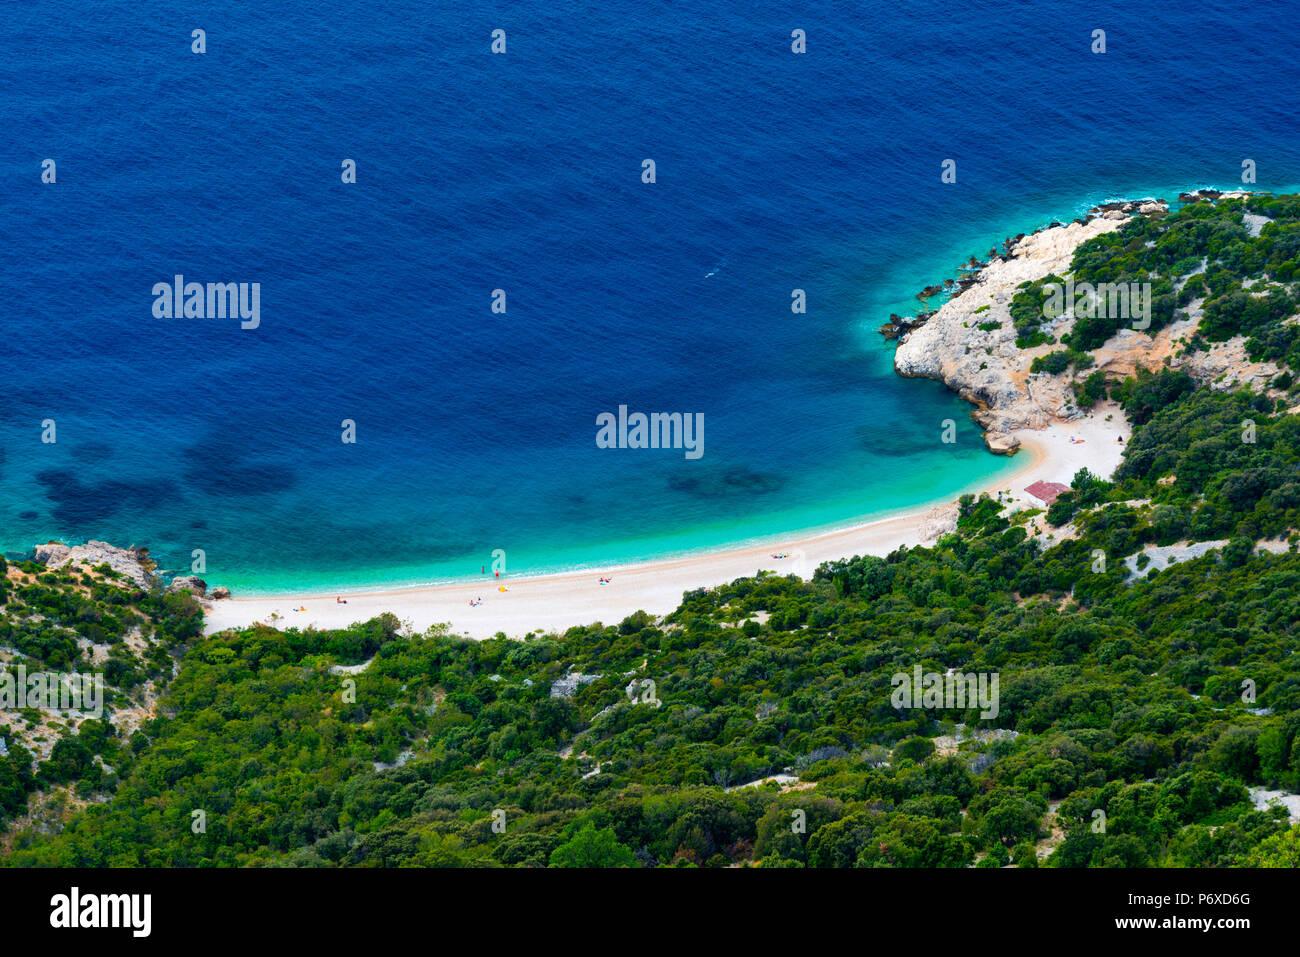 Croatia, Cres Island, Lubenice beach - Stock Image